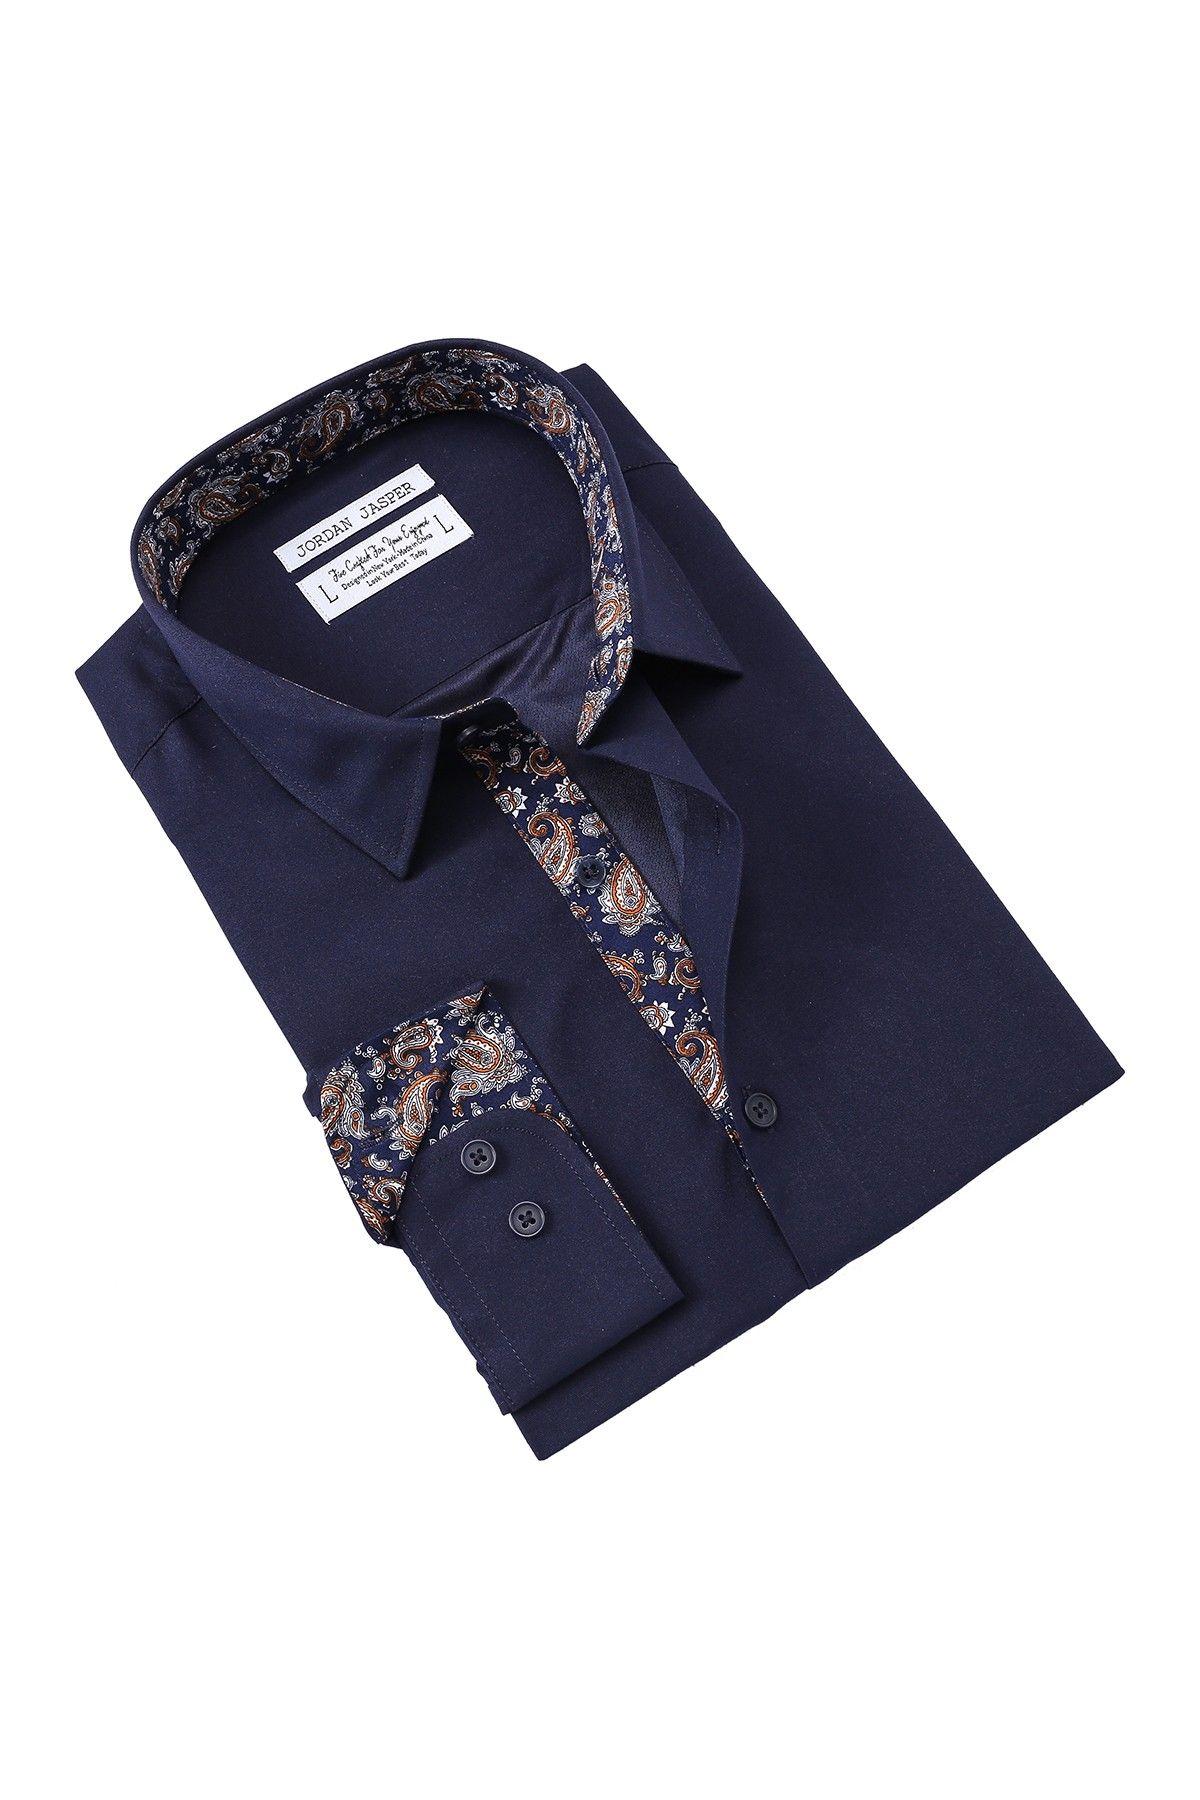 e4892a8a261a66 Jordan Jasper Novart Slim Fit Shirt Jasper